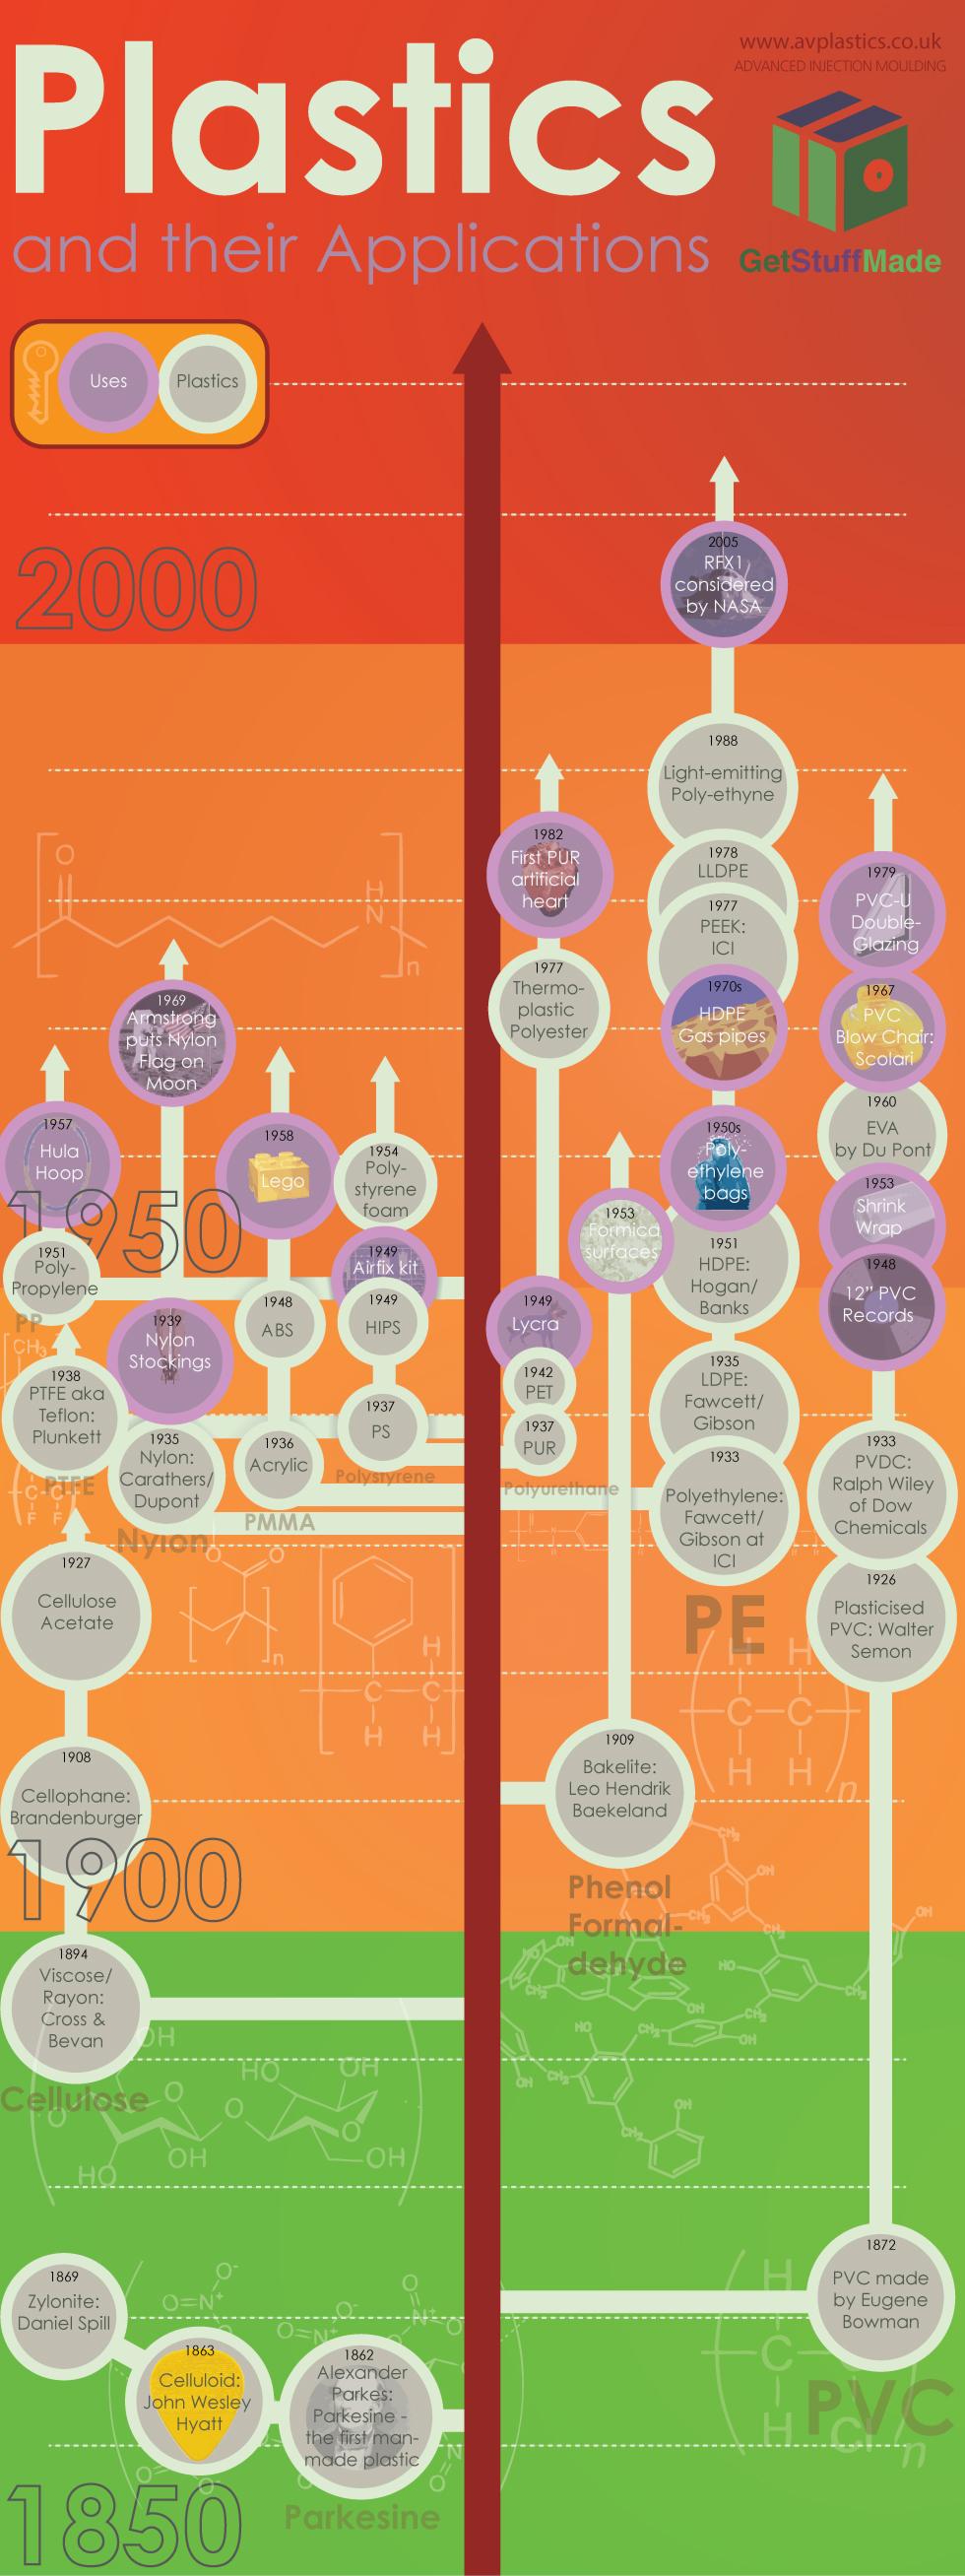 Injection Moulding Plastics Infographic Plastics History